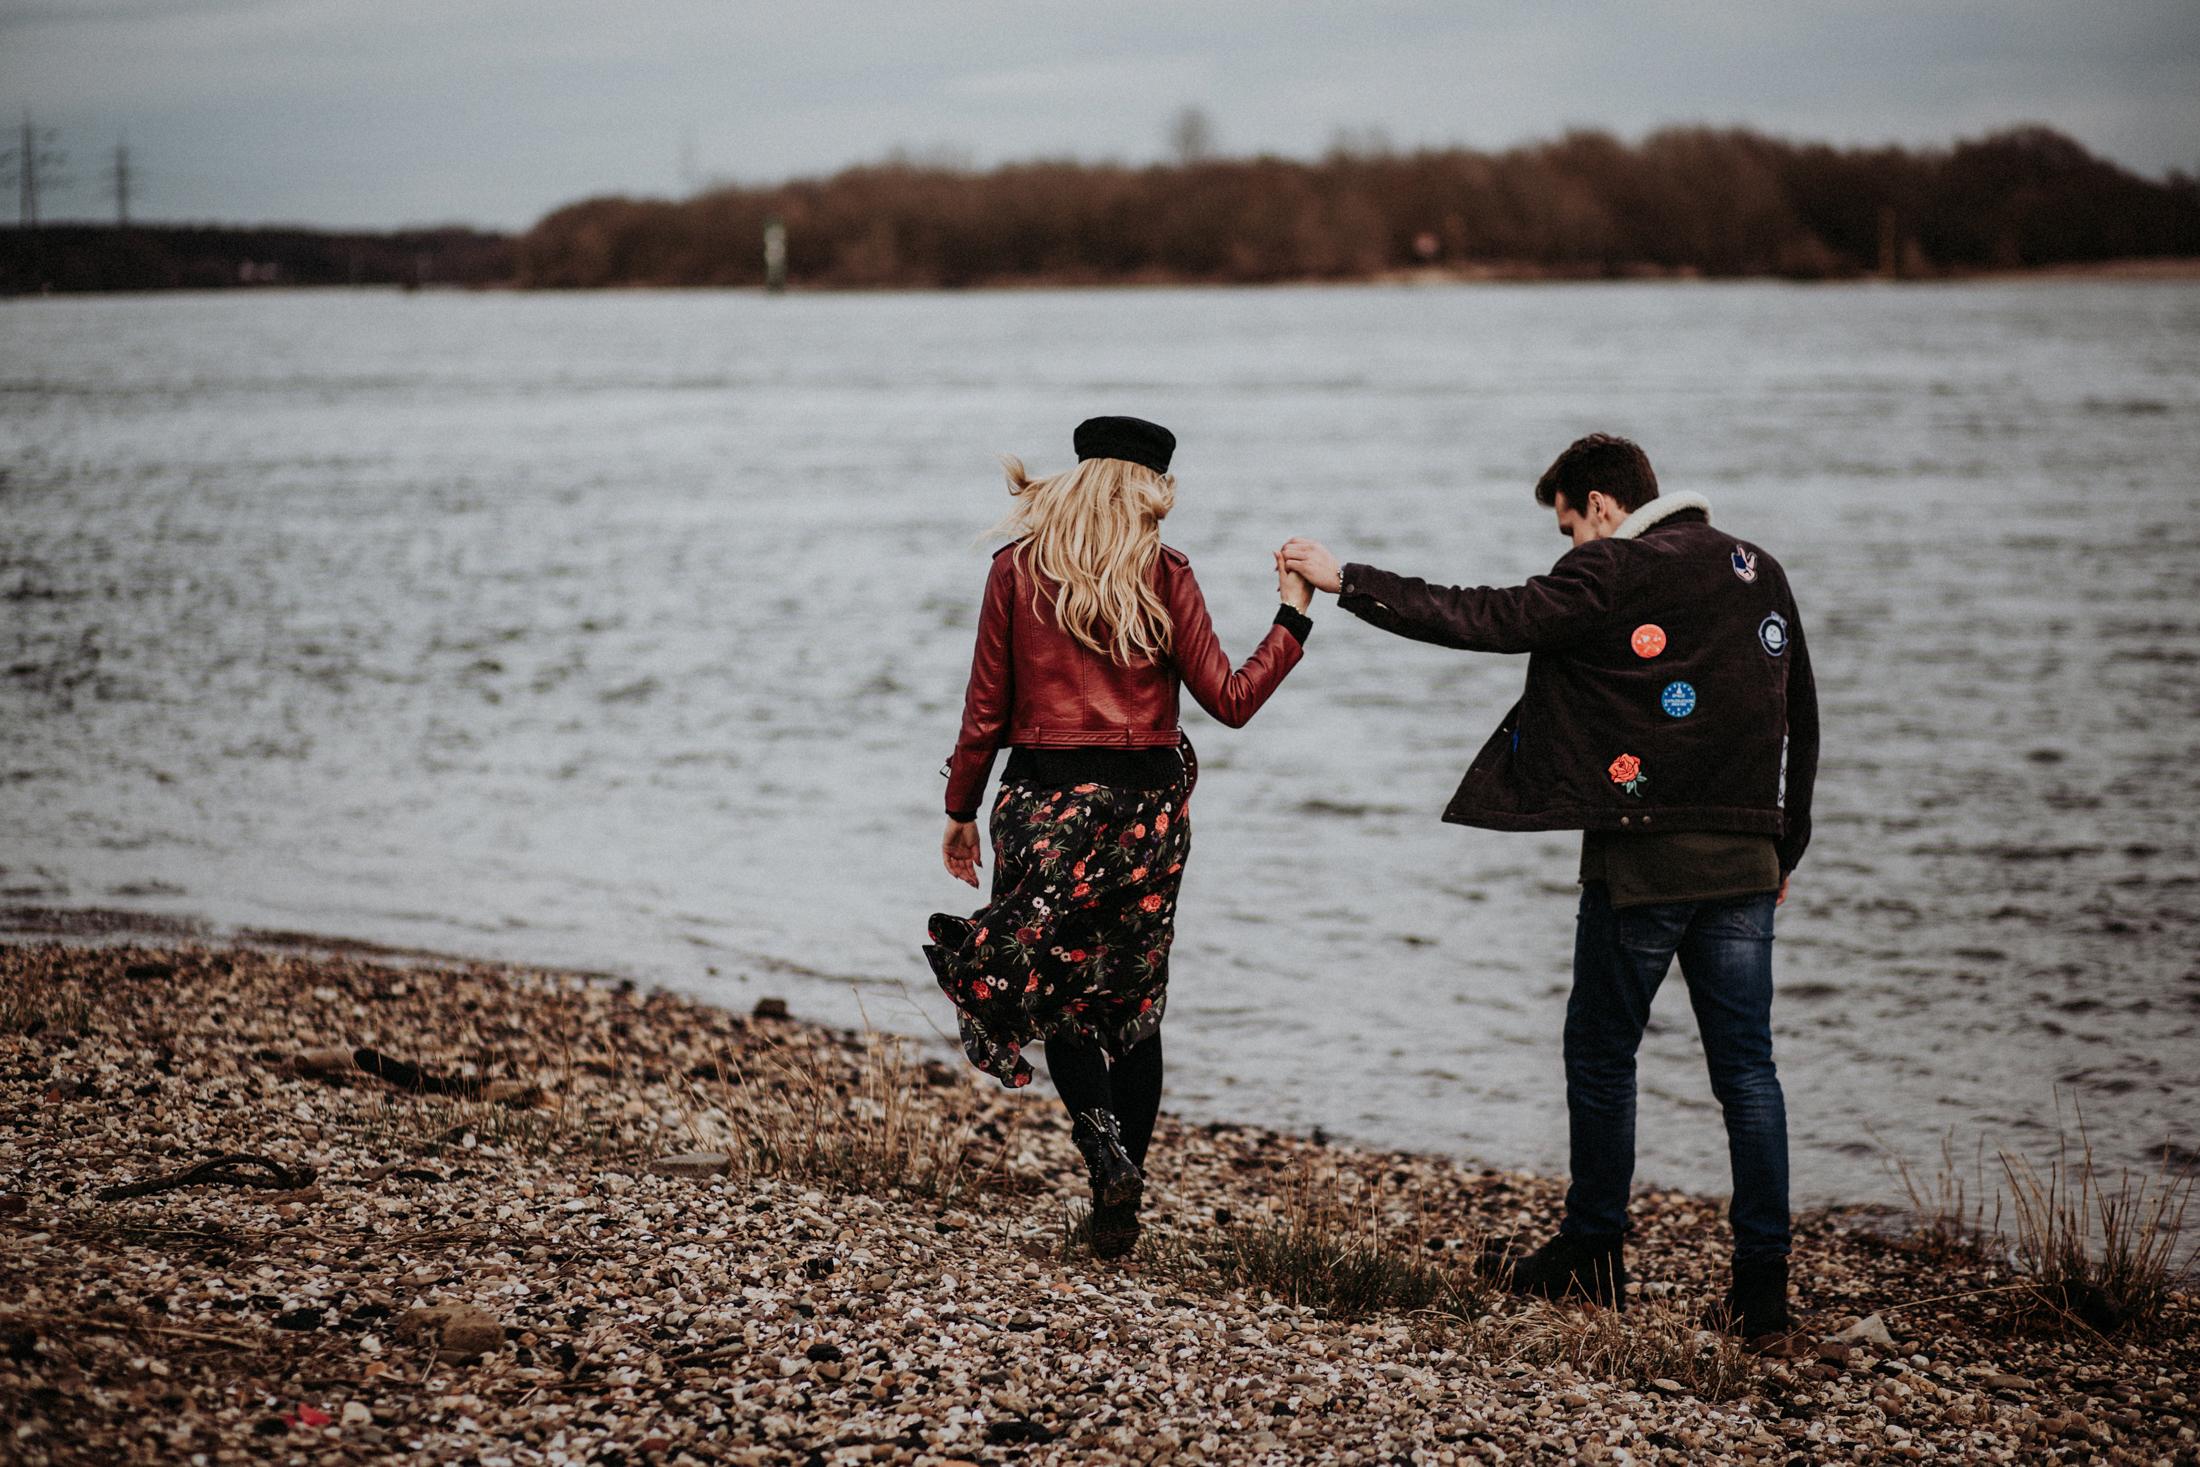 Wedding_Photographer_Mallorca_DanielaMarquardt_Photography_CanaryIslands_Lanzarote_Iceland_Tuscany_Santorini_Portugal_NewYork_Spain_Elopement_Hochzeitsfotograf_CK125